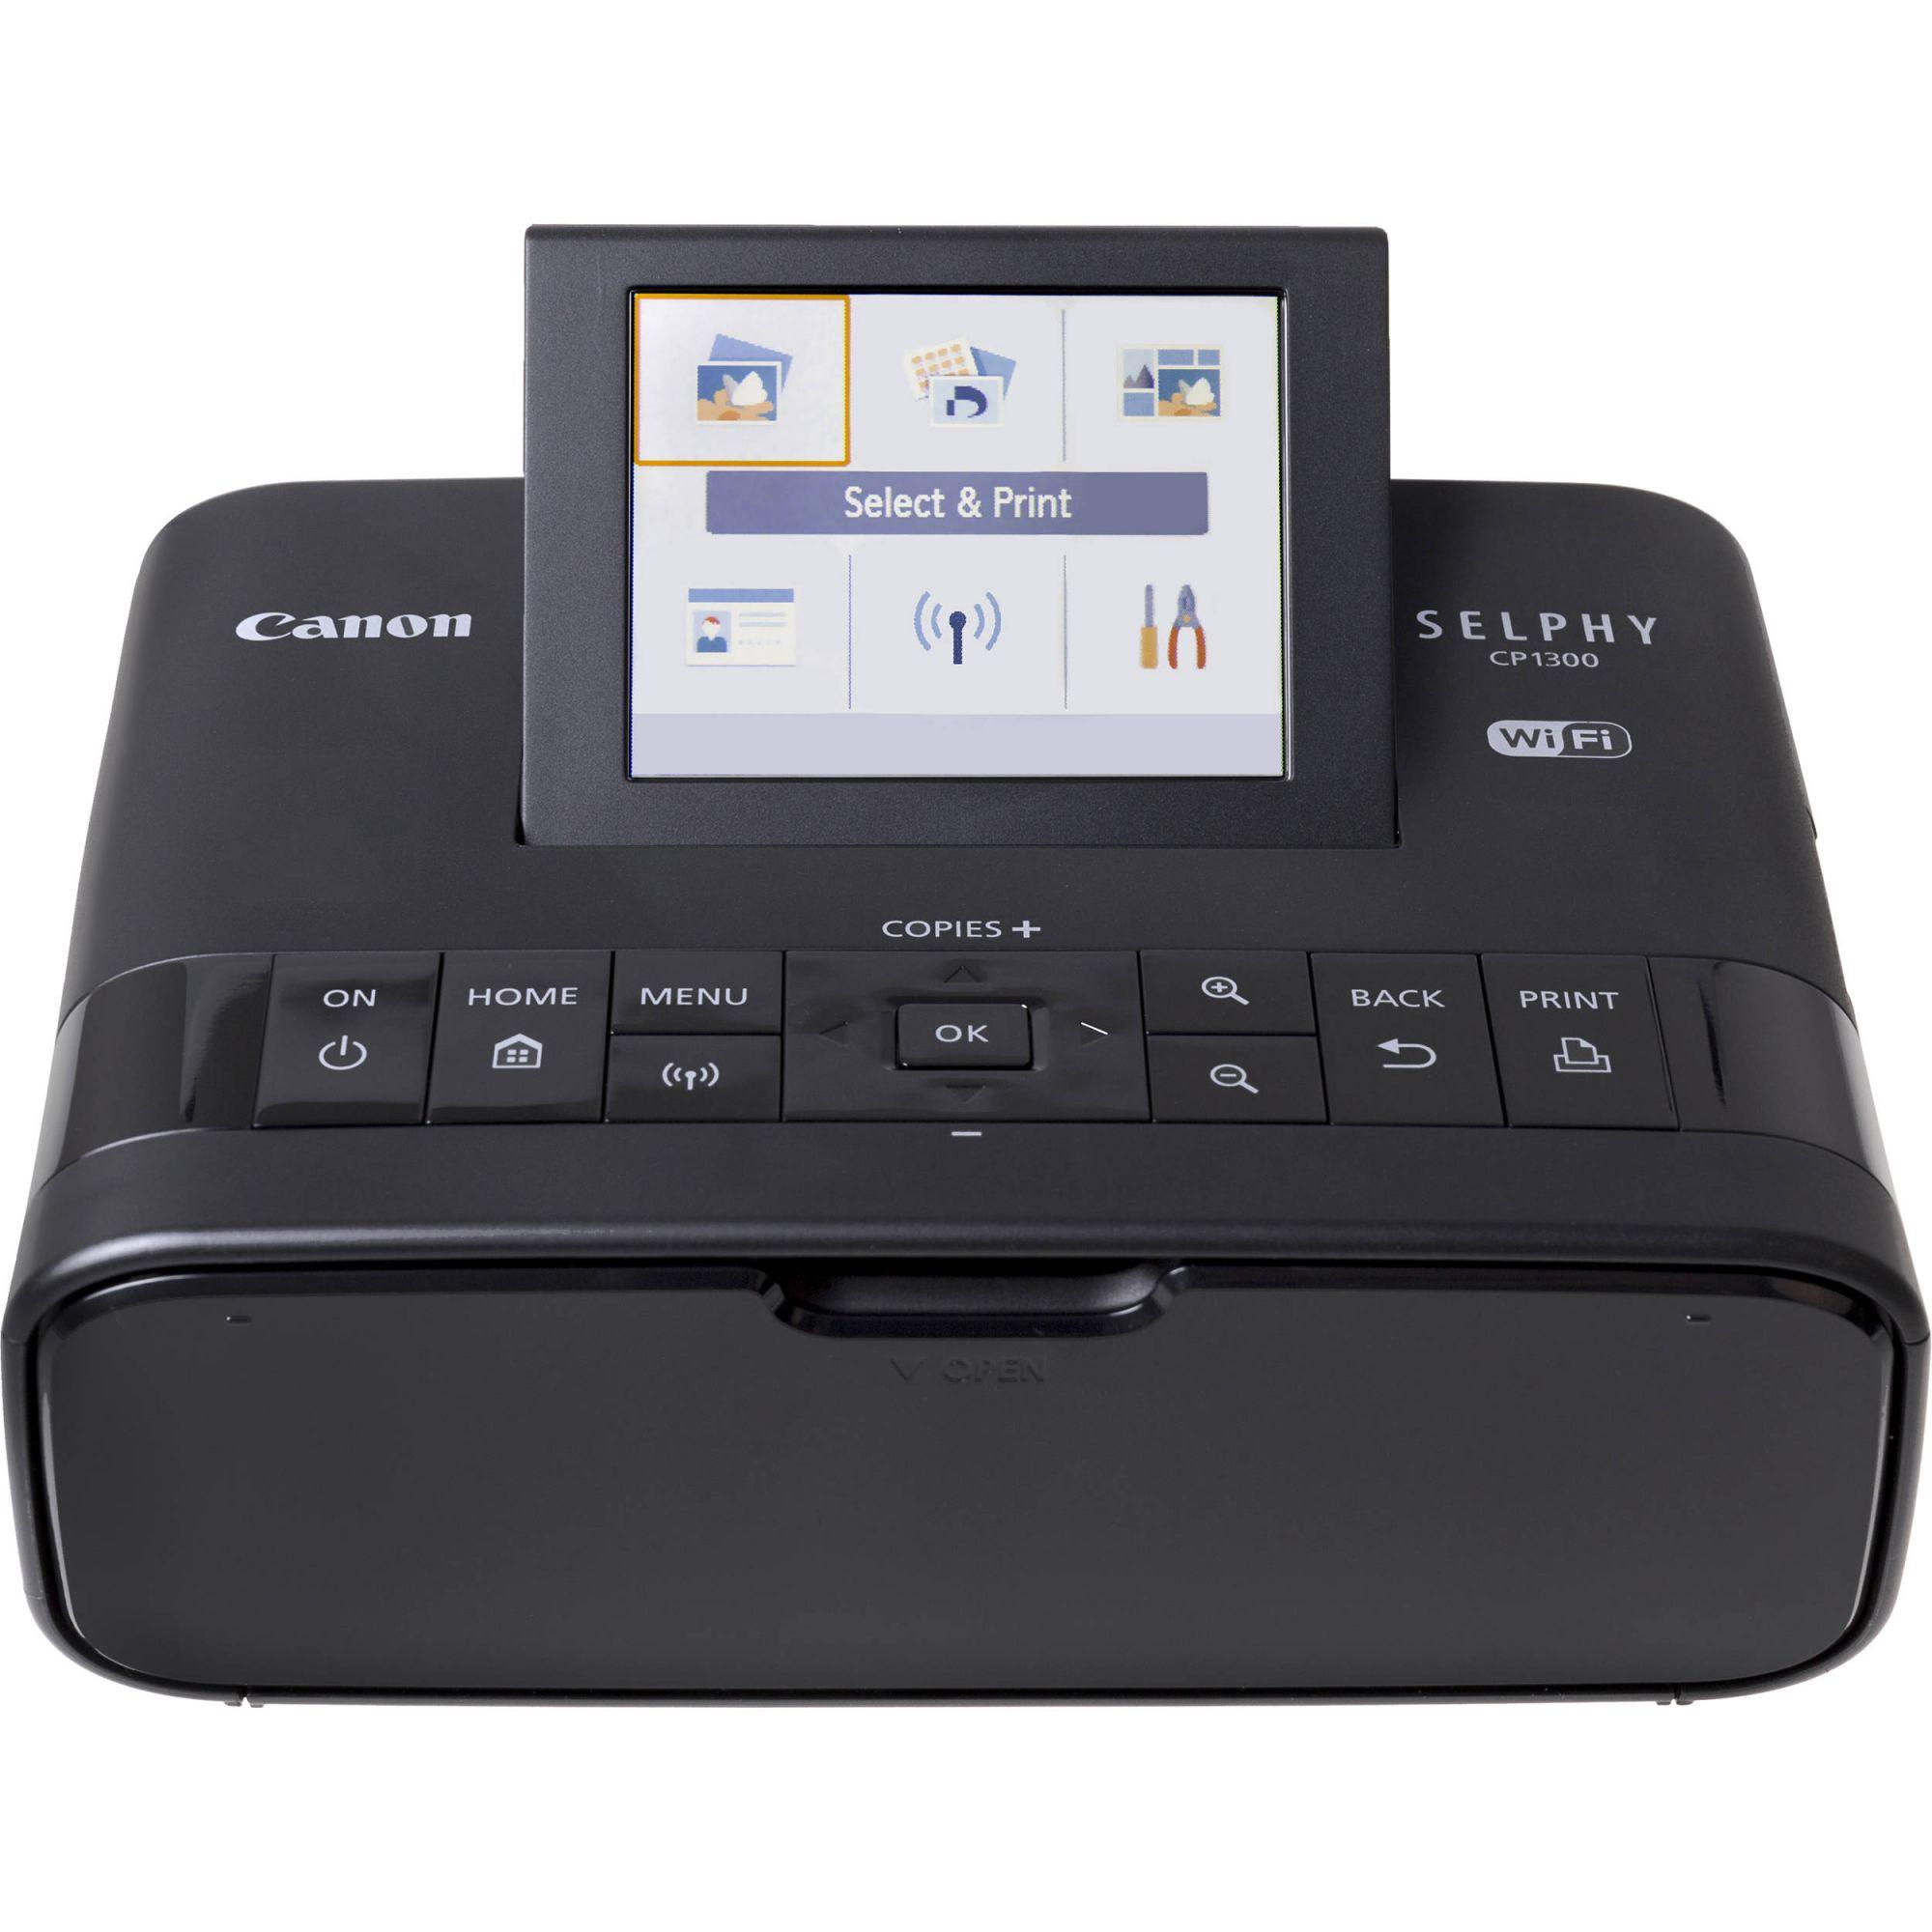 Kit Impressora Fotográfica Canon Portátil + Bateria Recarregável - CP1300+NB-CP2LH